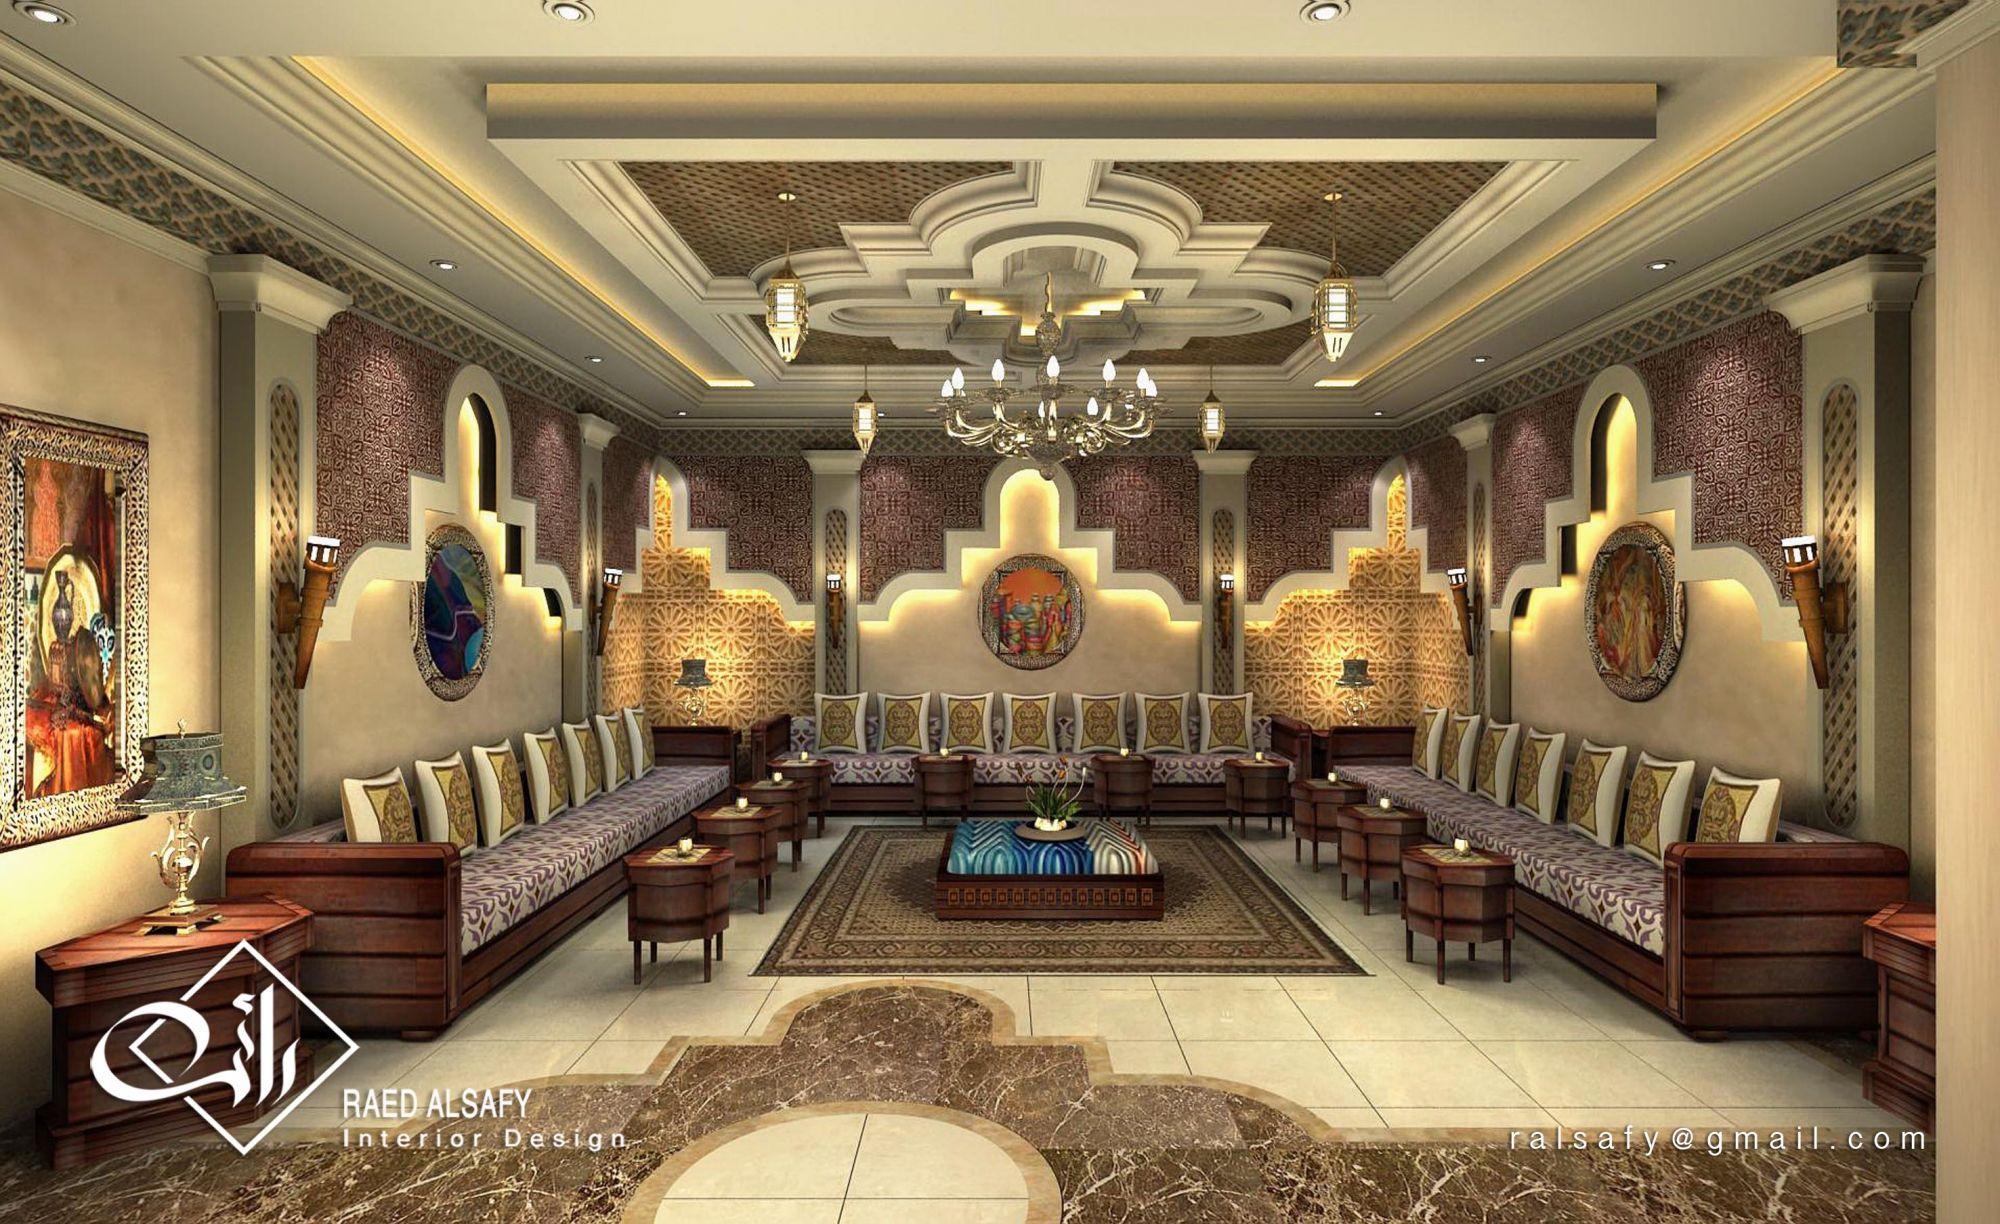 Image result for moroccan majlis interior interiors